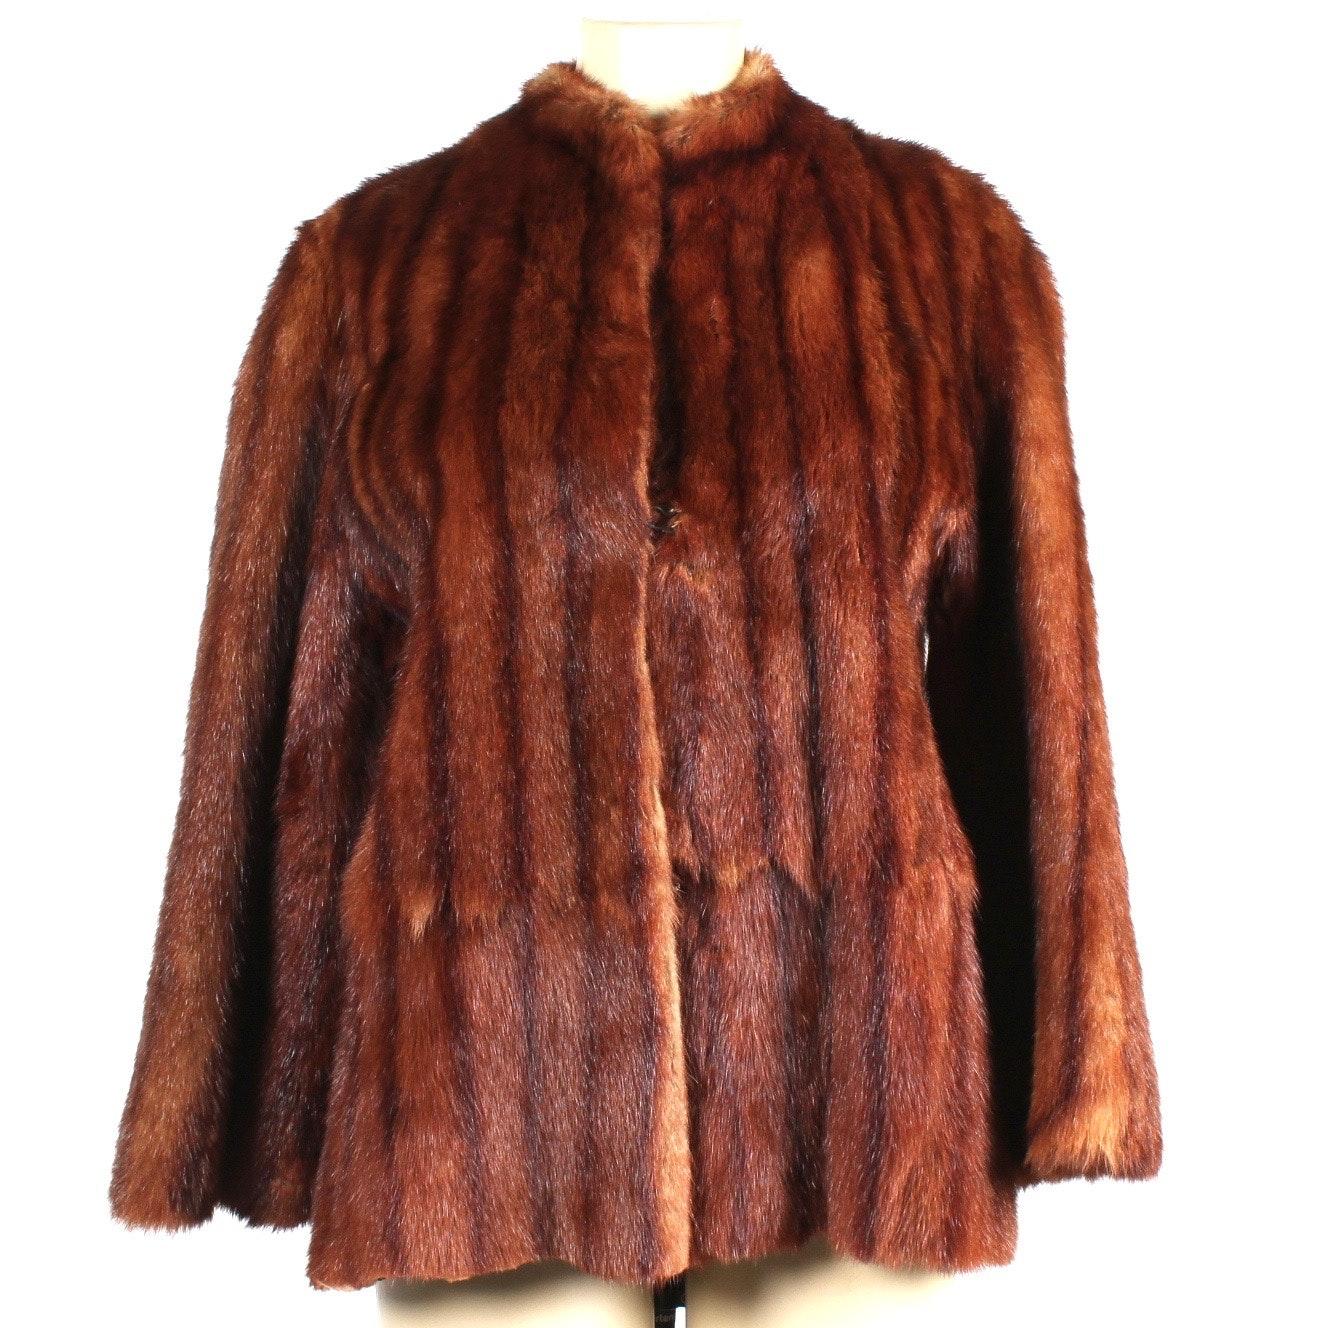 Vintage Marmot Fur Coat from Margo Furs